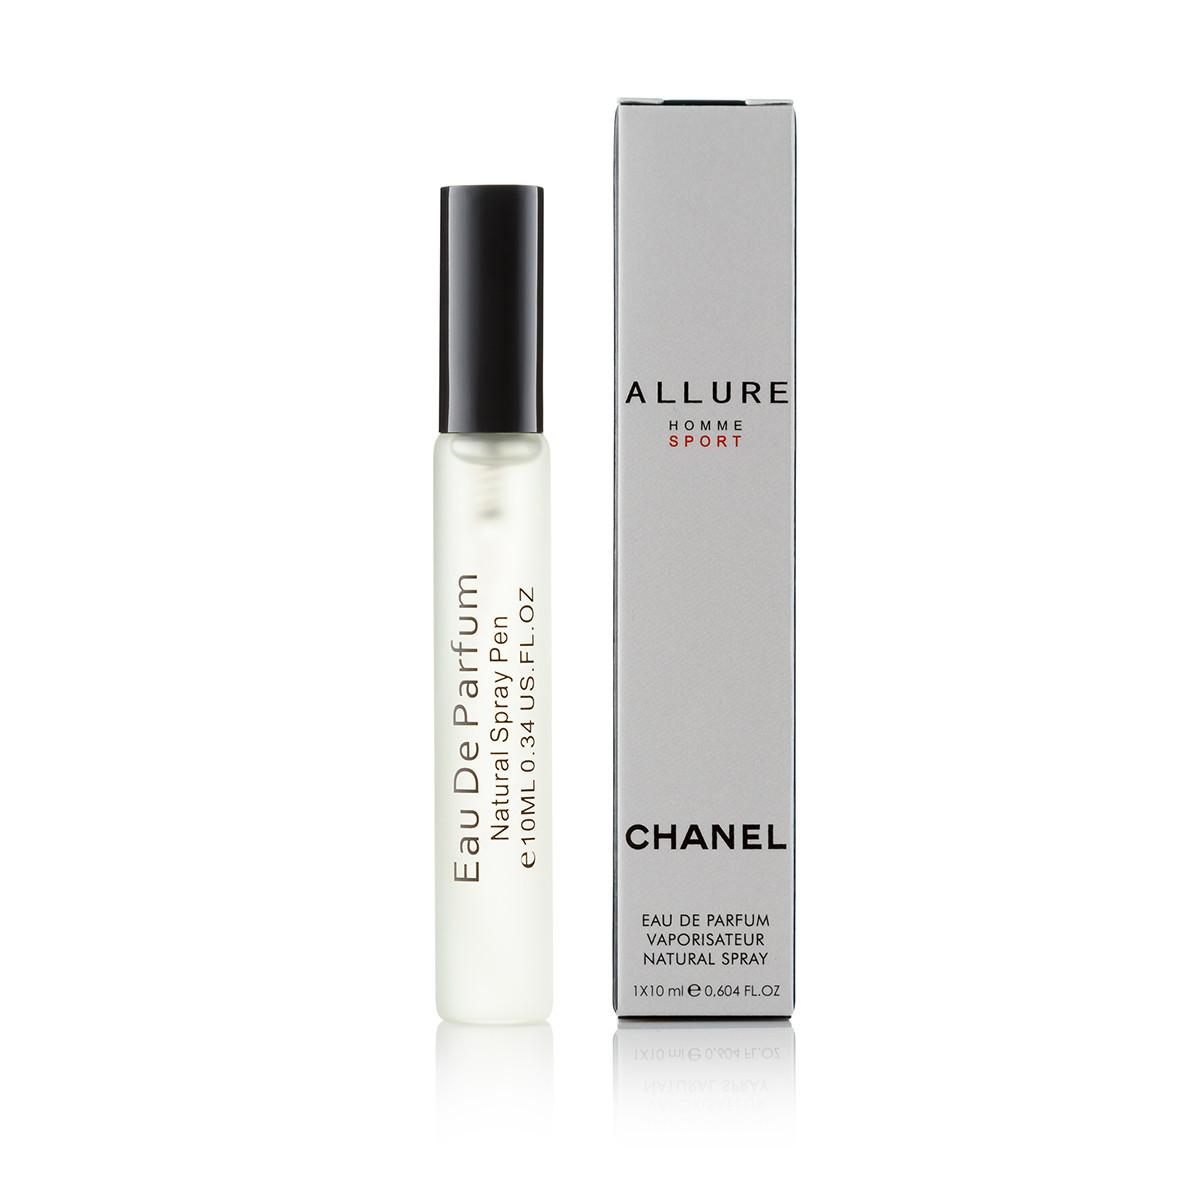 10 мл парфюм спрей в ручке Allure homme Sport (М) Д-10